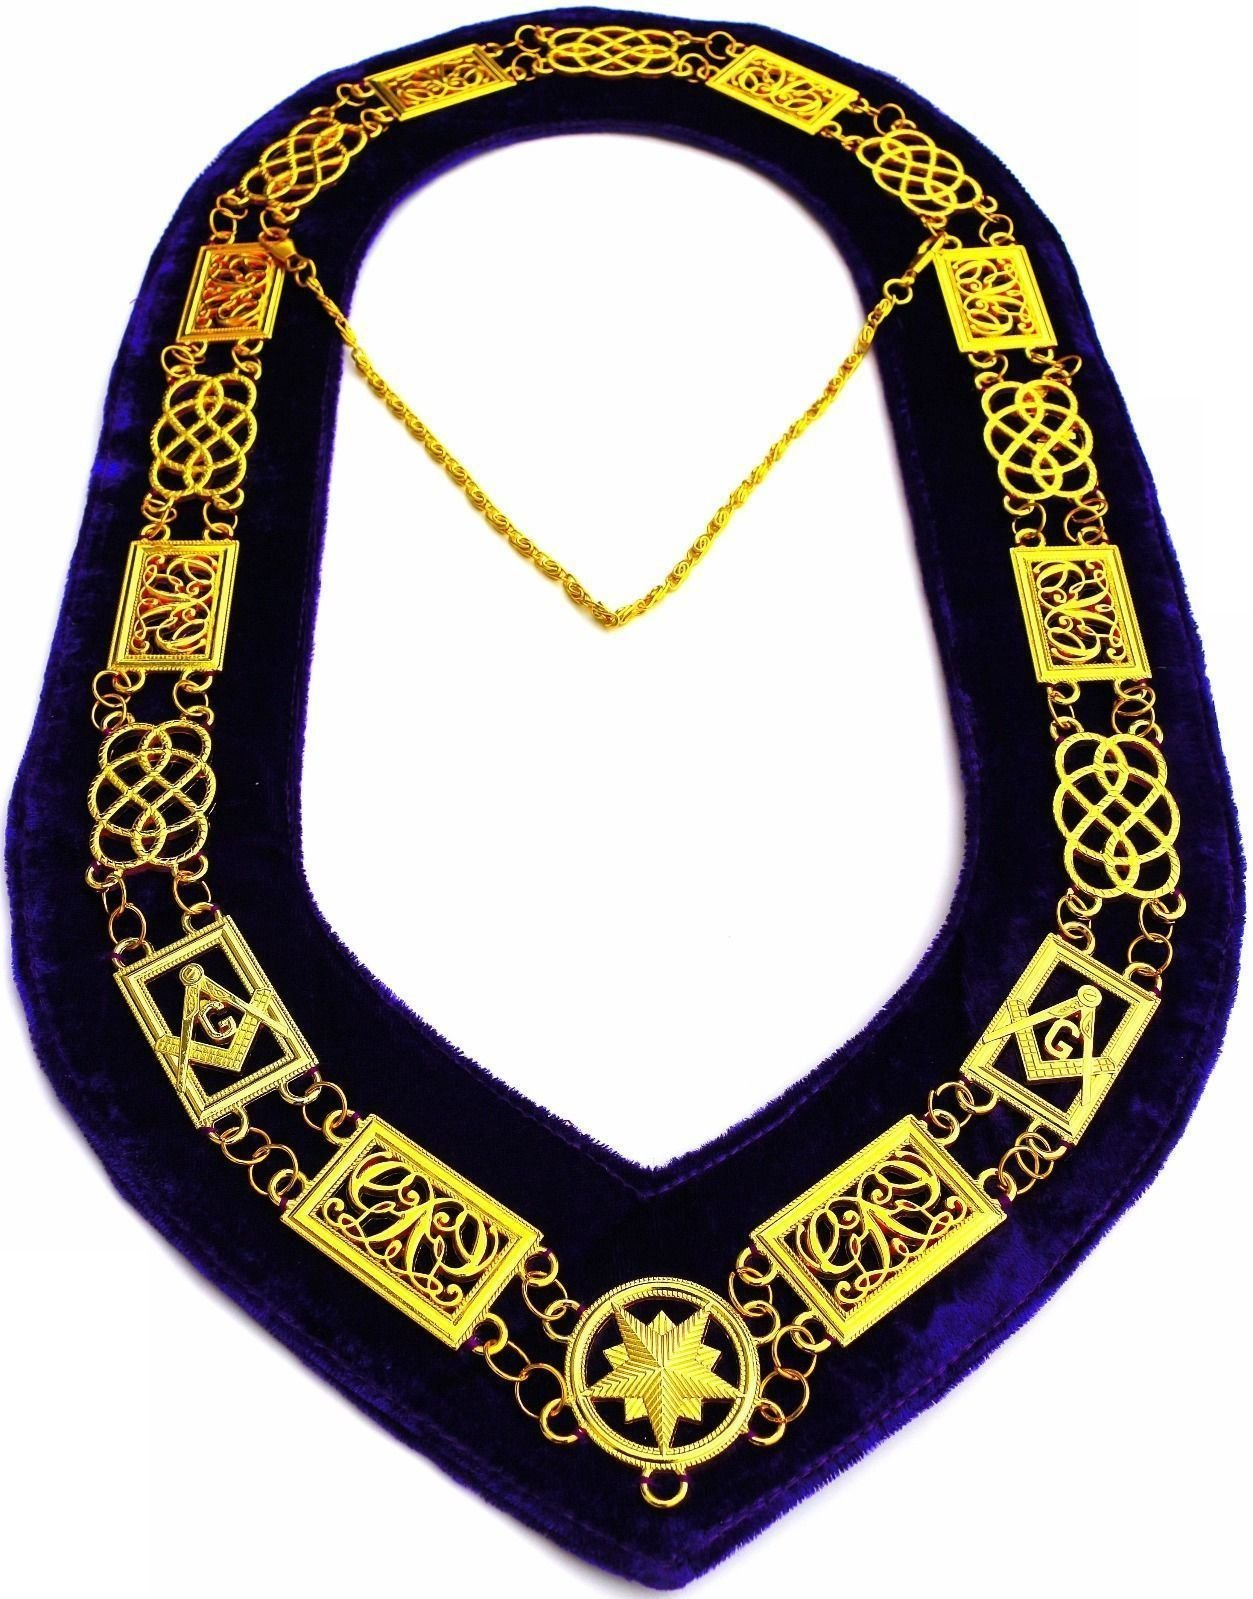 DEURA Masonic Collar Freemason Grand Lodge Master Mason Gold Plated // Purple Velvet Backing DMR-100GP